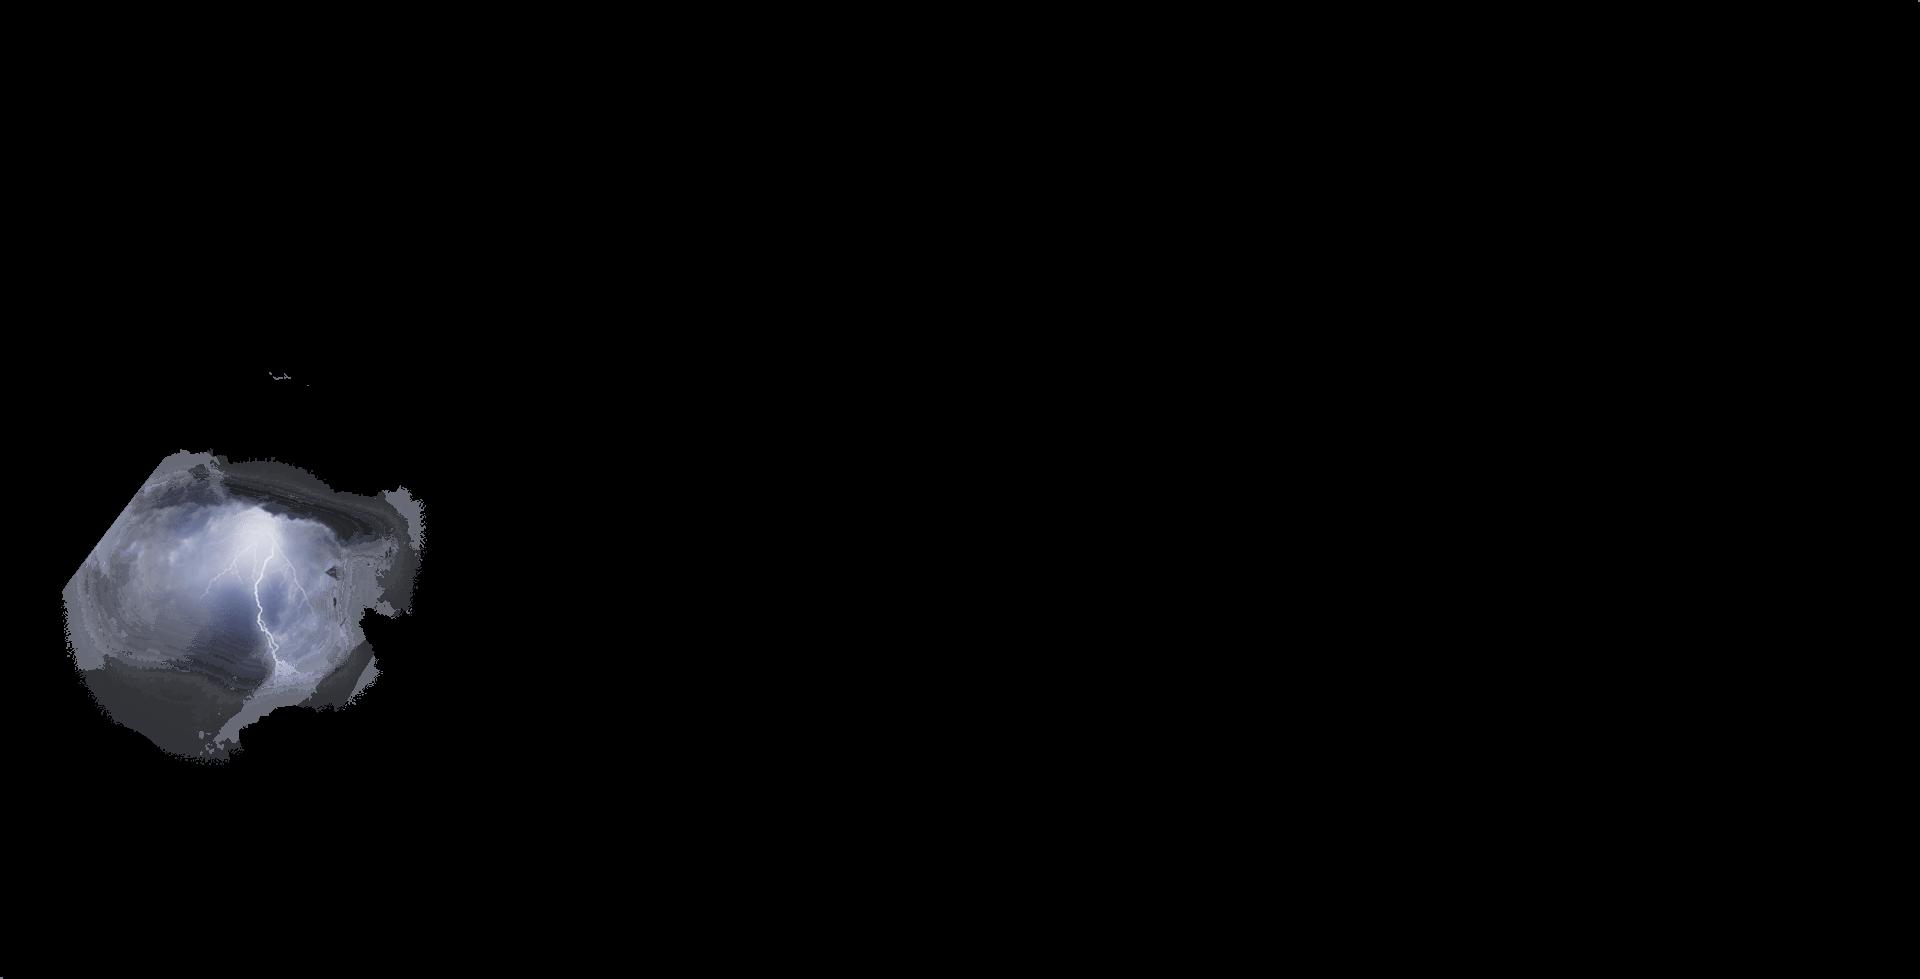 mockup-1